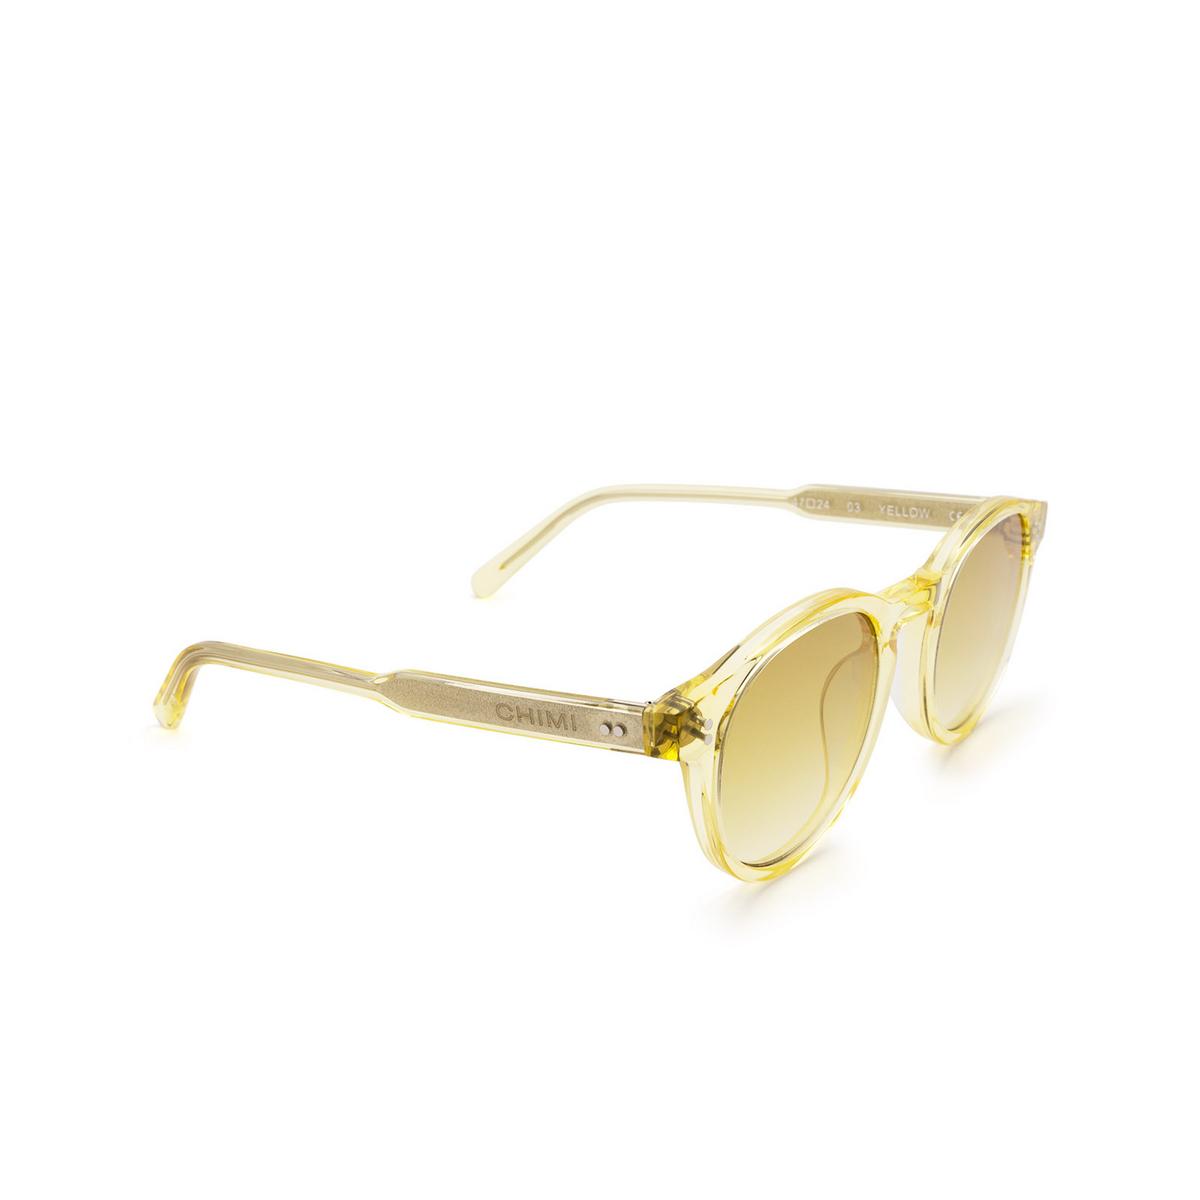 Chimi® Round Sunglasses: 03 color Yellow - three-quarters view.